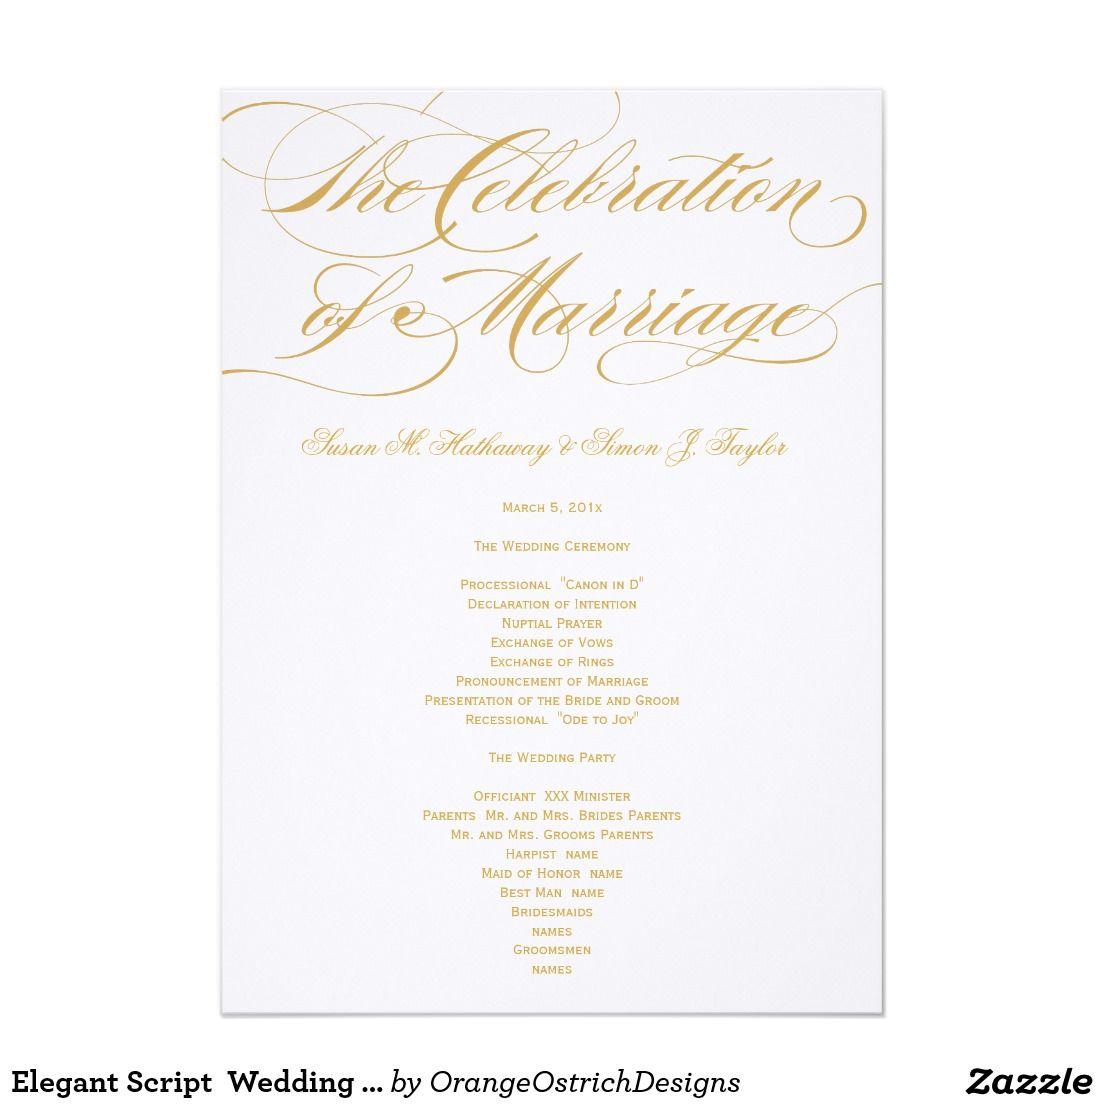 Elegant Script Wedding Program